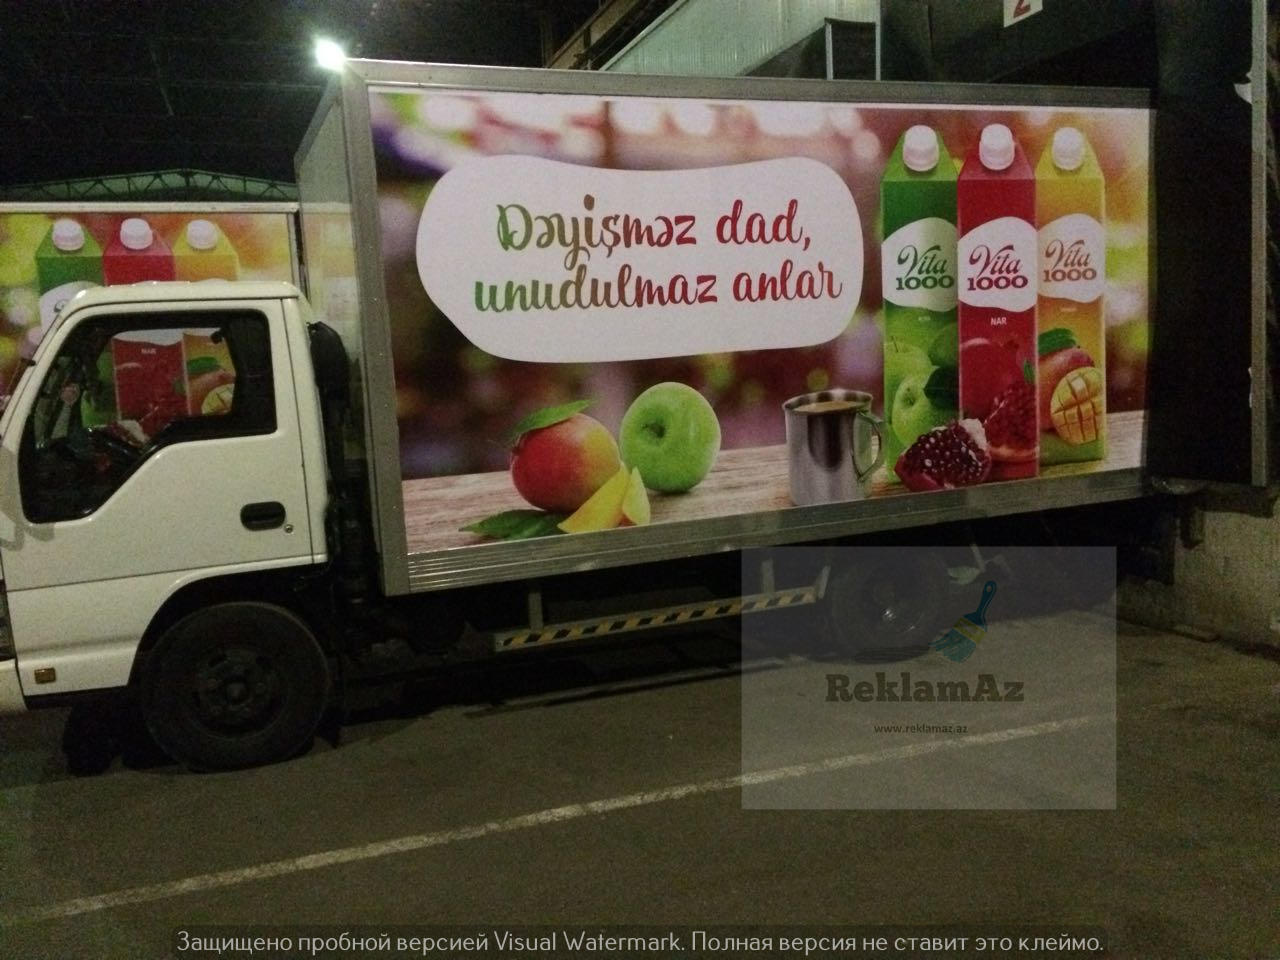 vita1000 reklam2